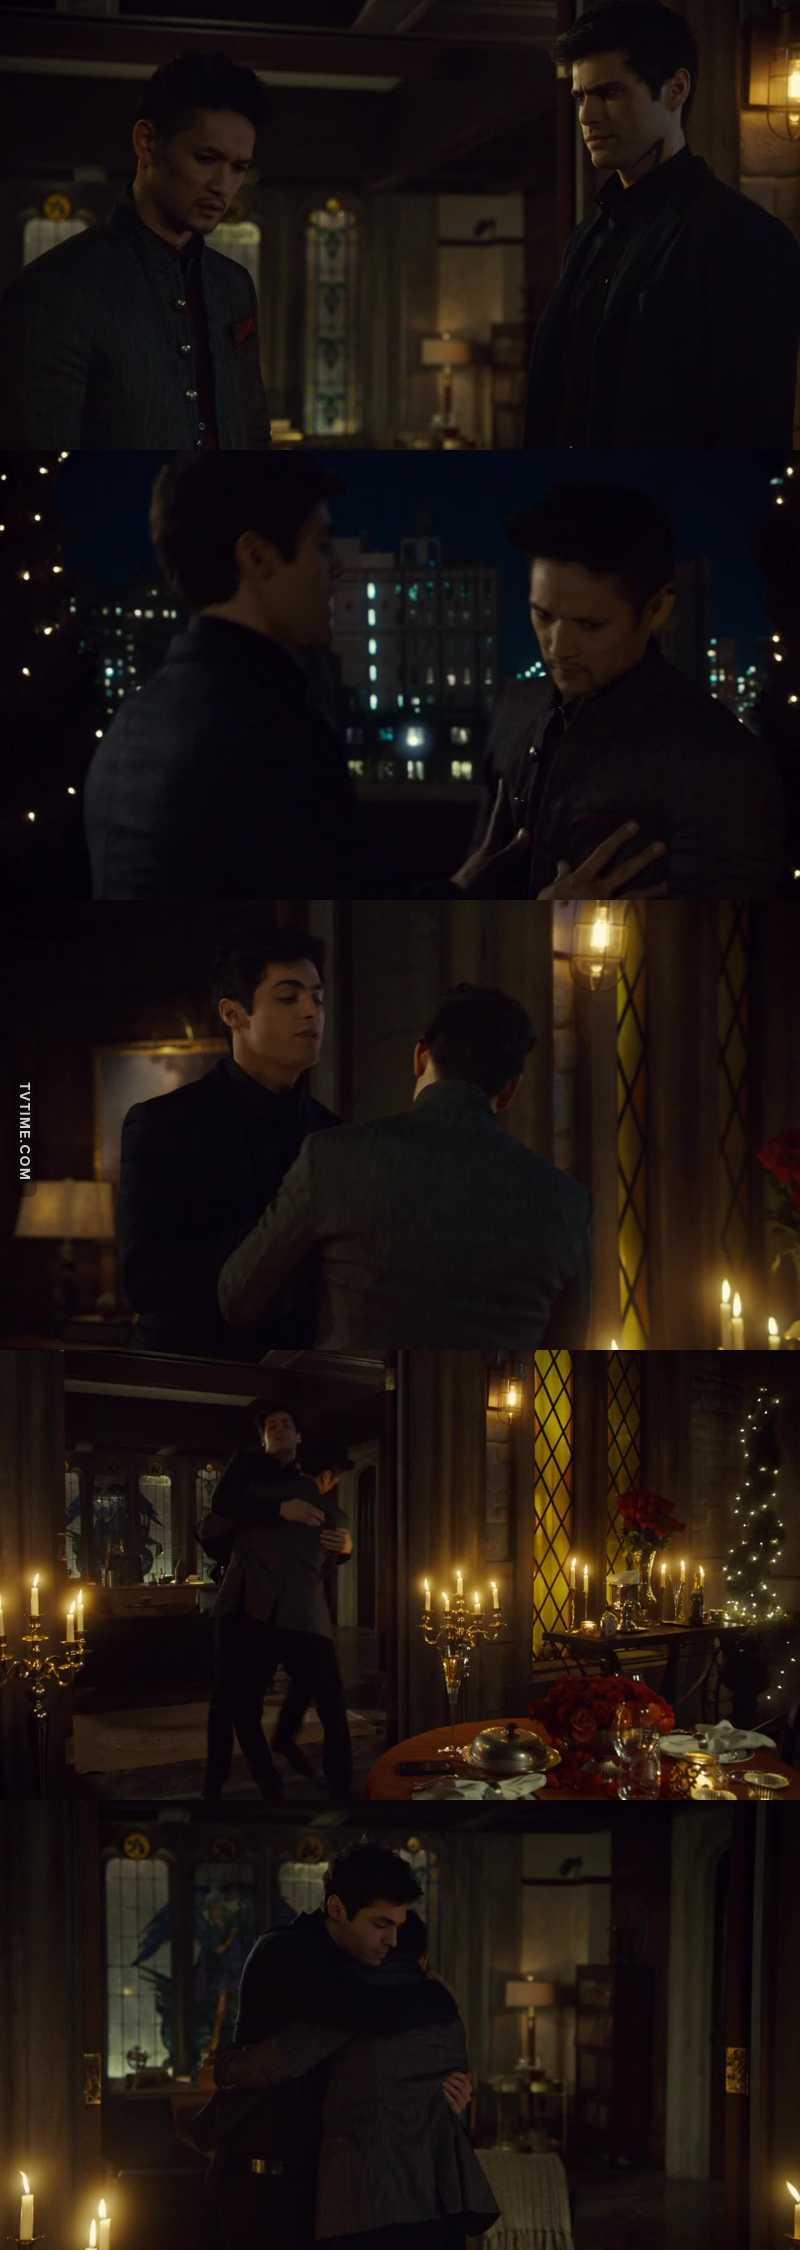 this scene was heartbreaking:((